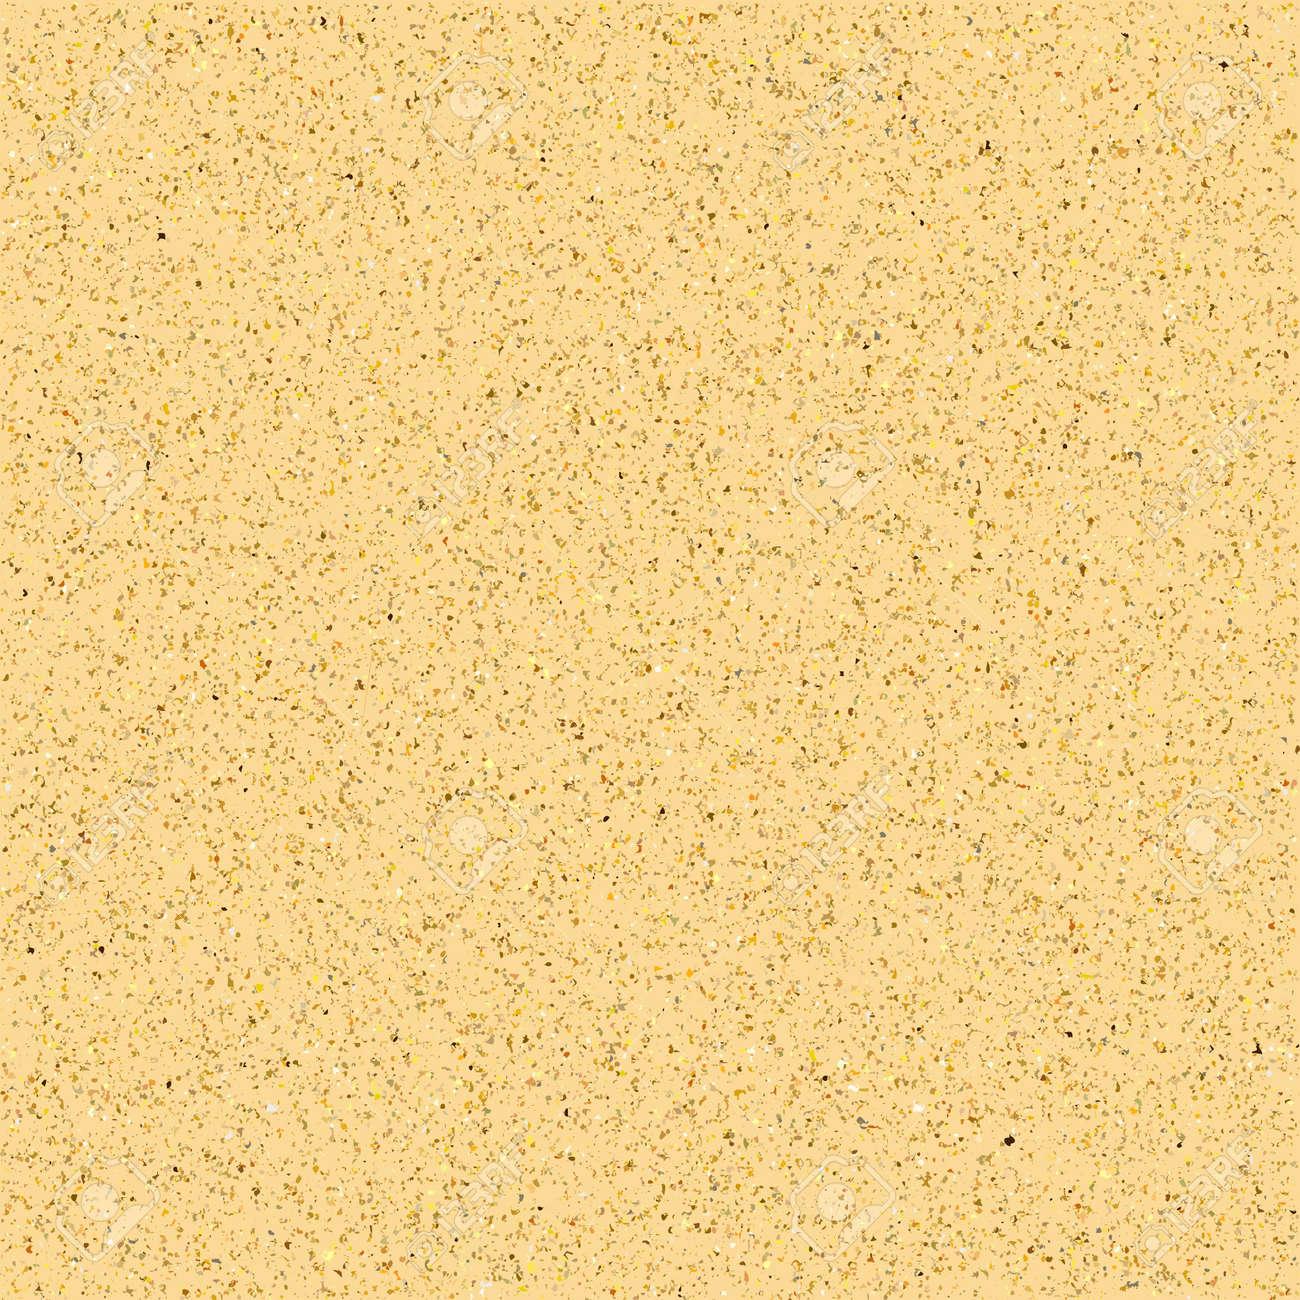 tropical sand texture - 60539691